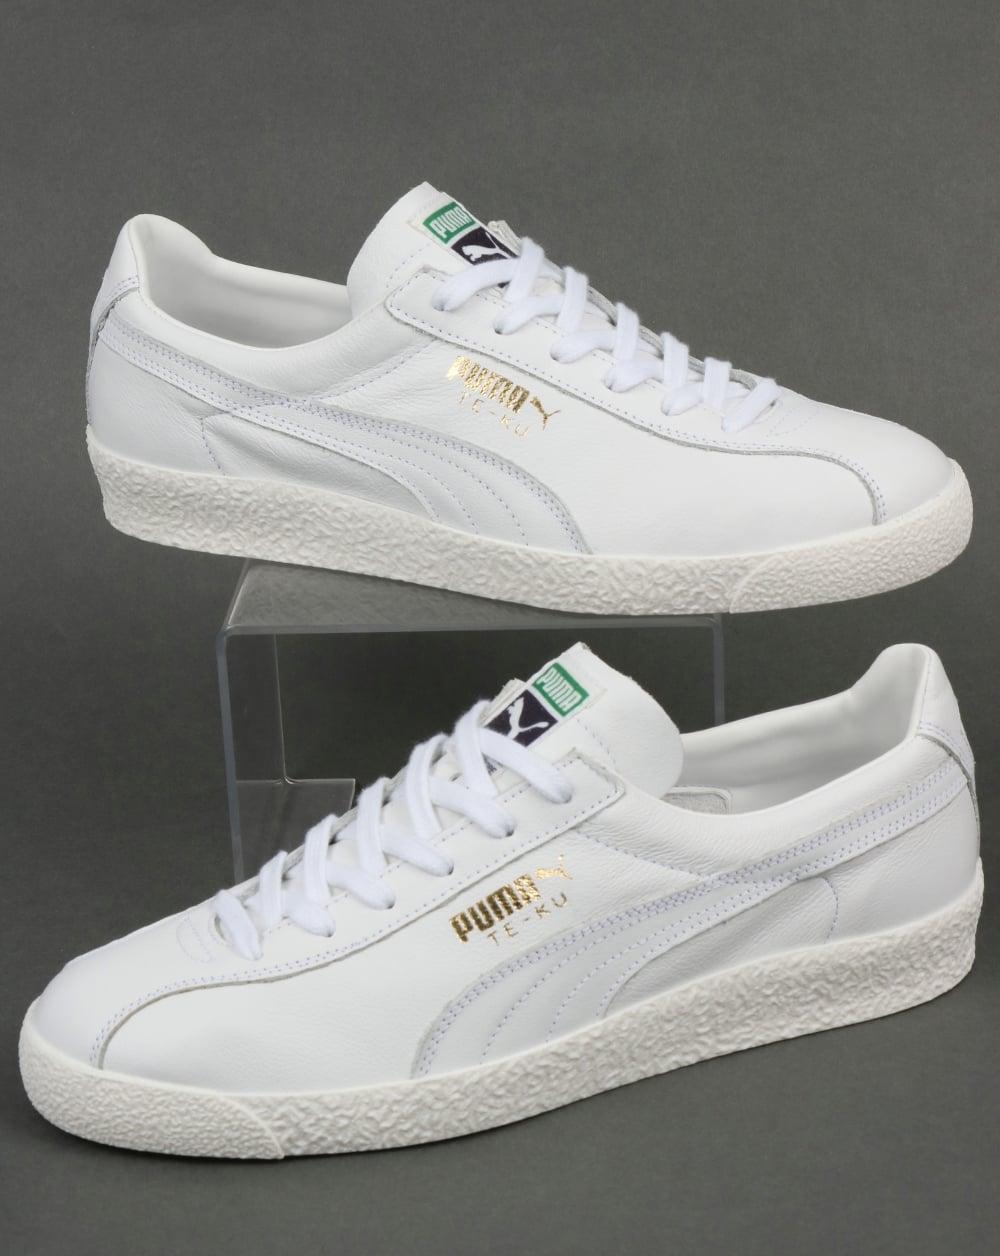 veneno licencia administrar  Buy puma set trainers - 57% OFF! Share discount